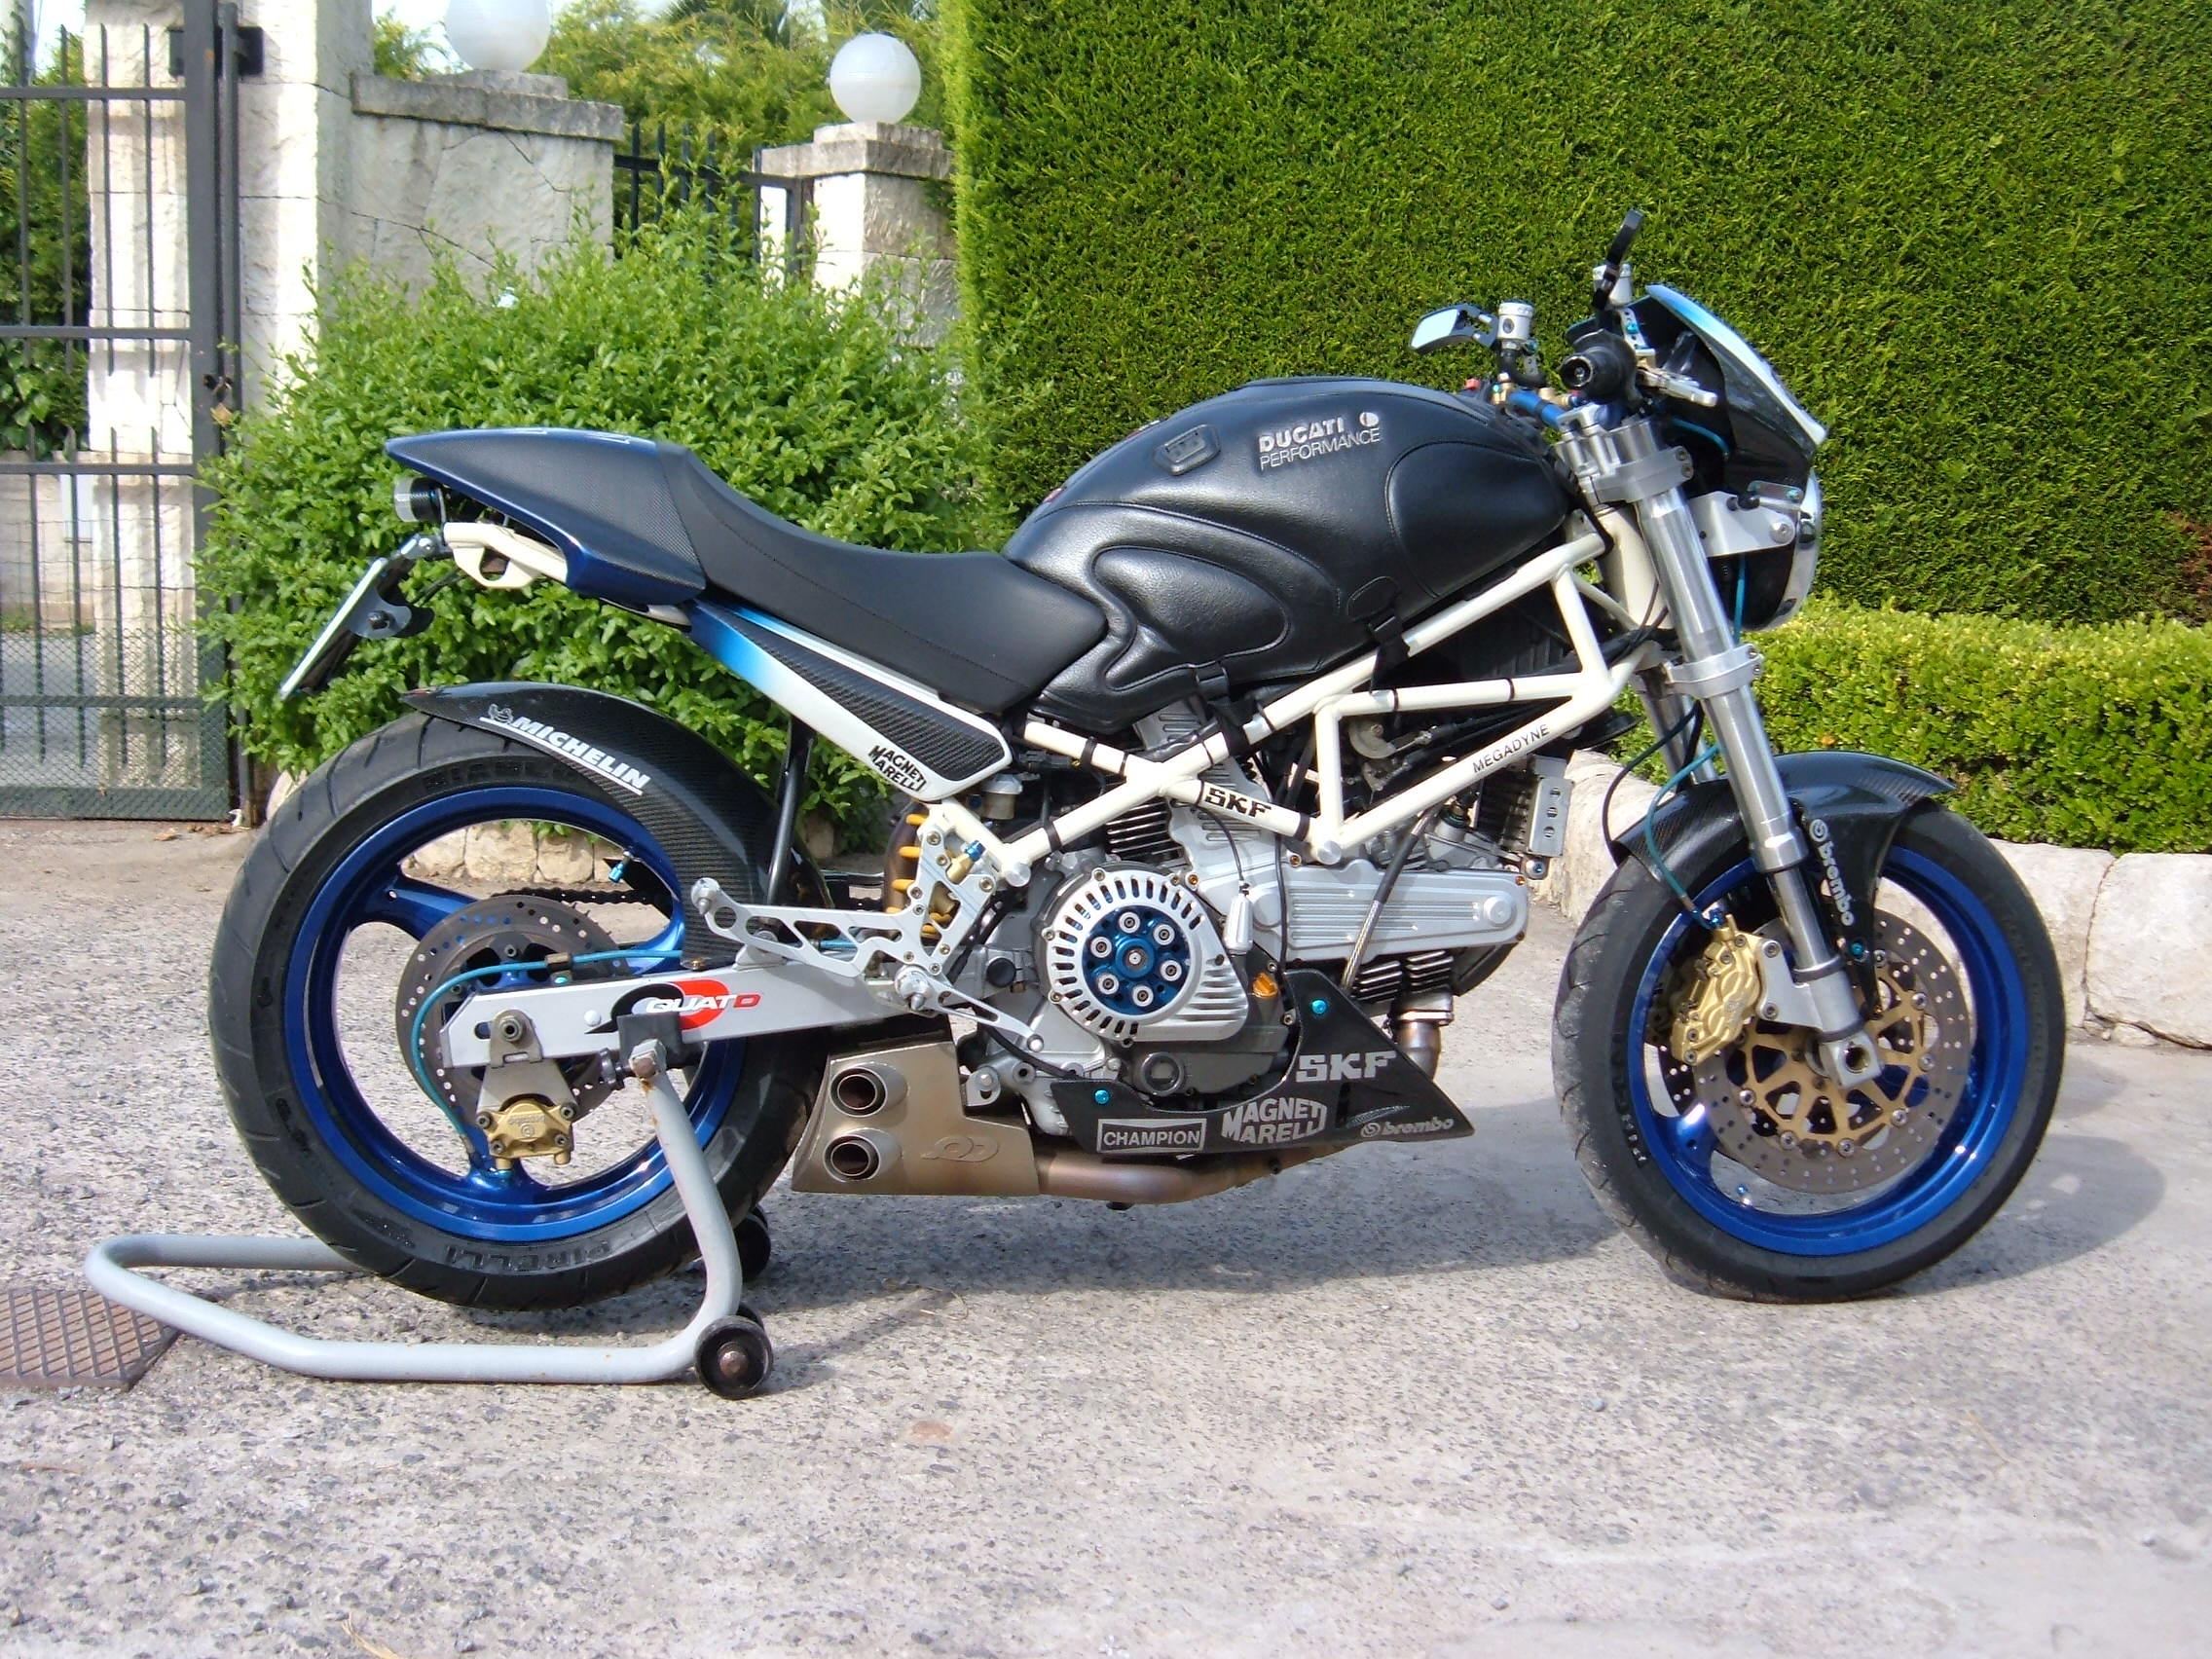 Ducati Monster 600 620 750 800 900 1000 Ex Box Series Stainless